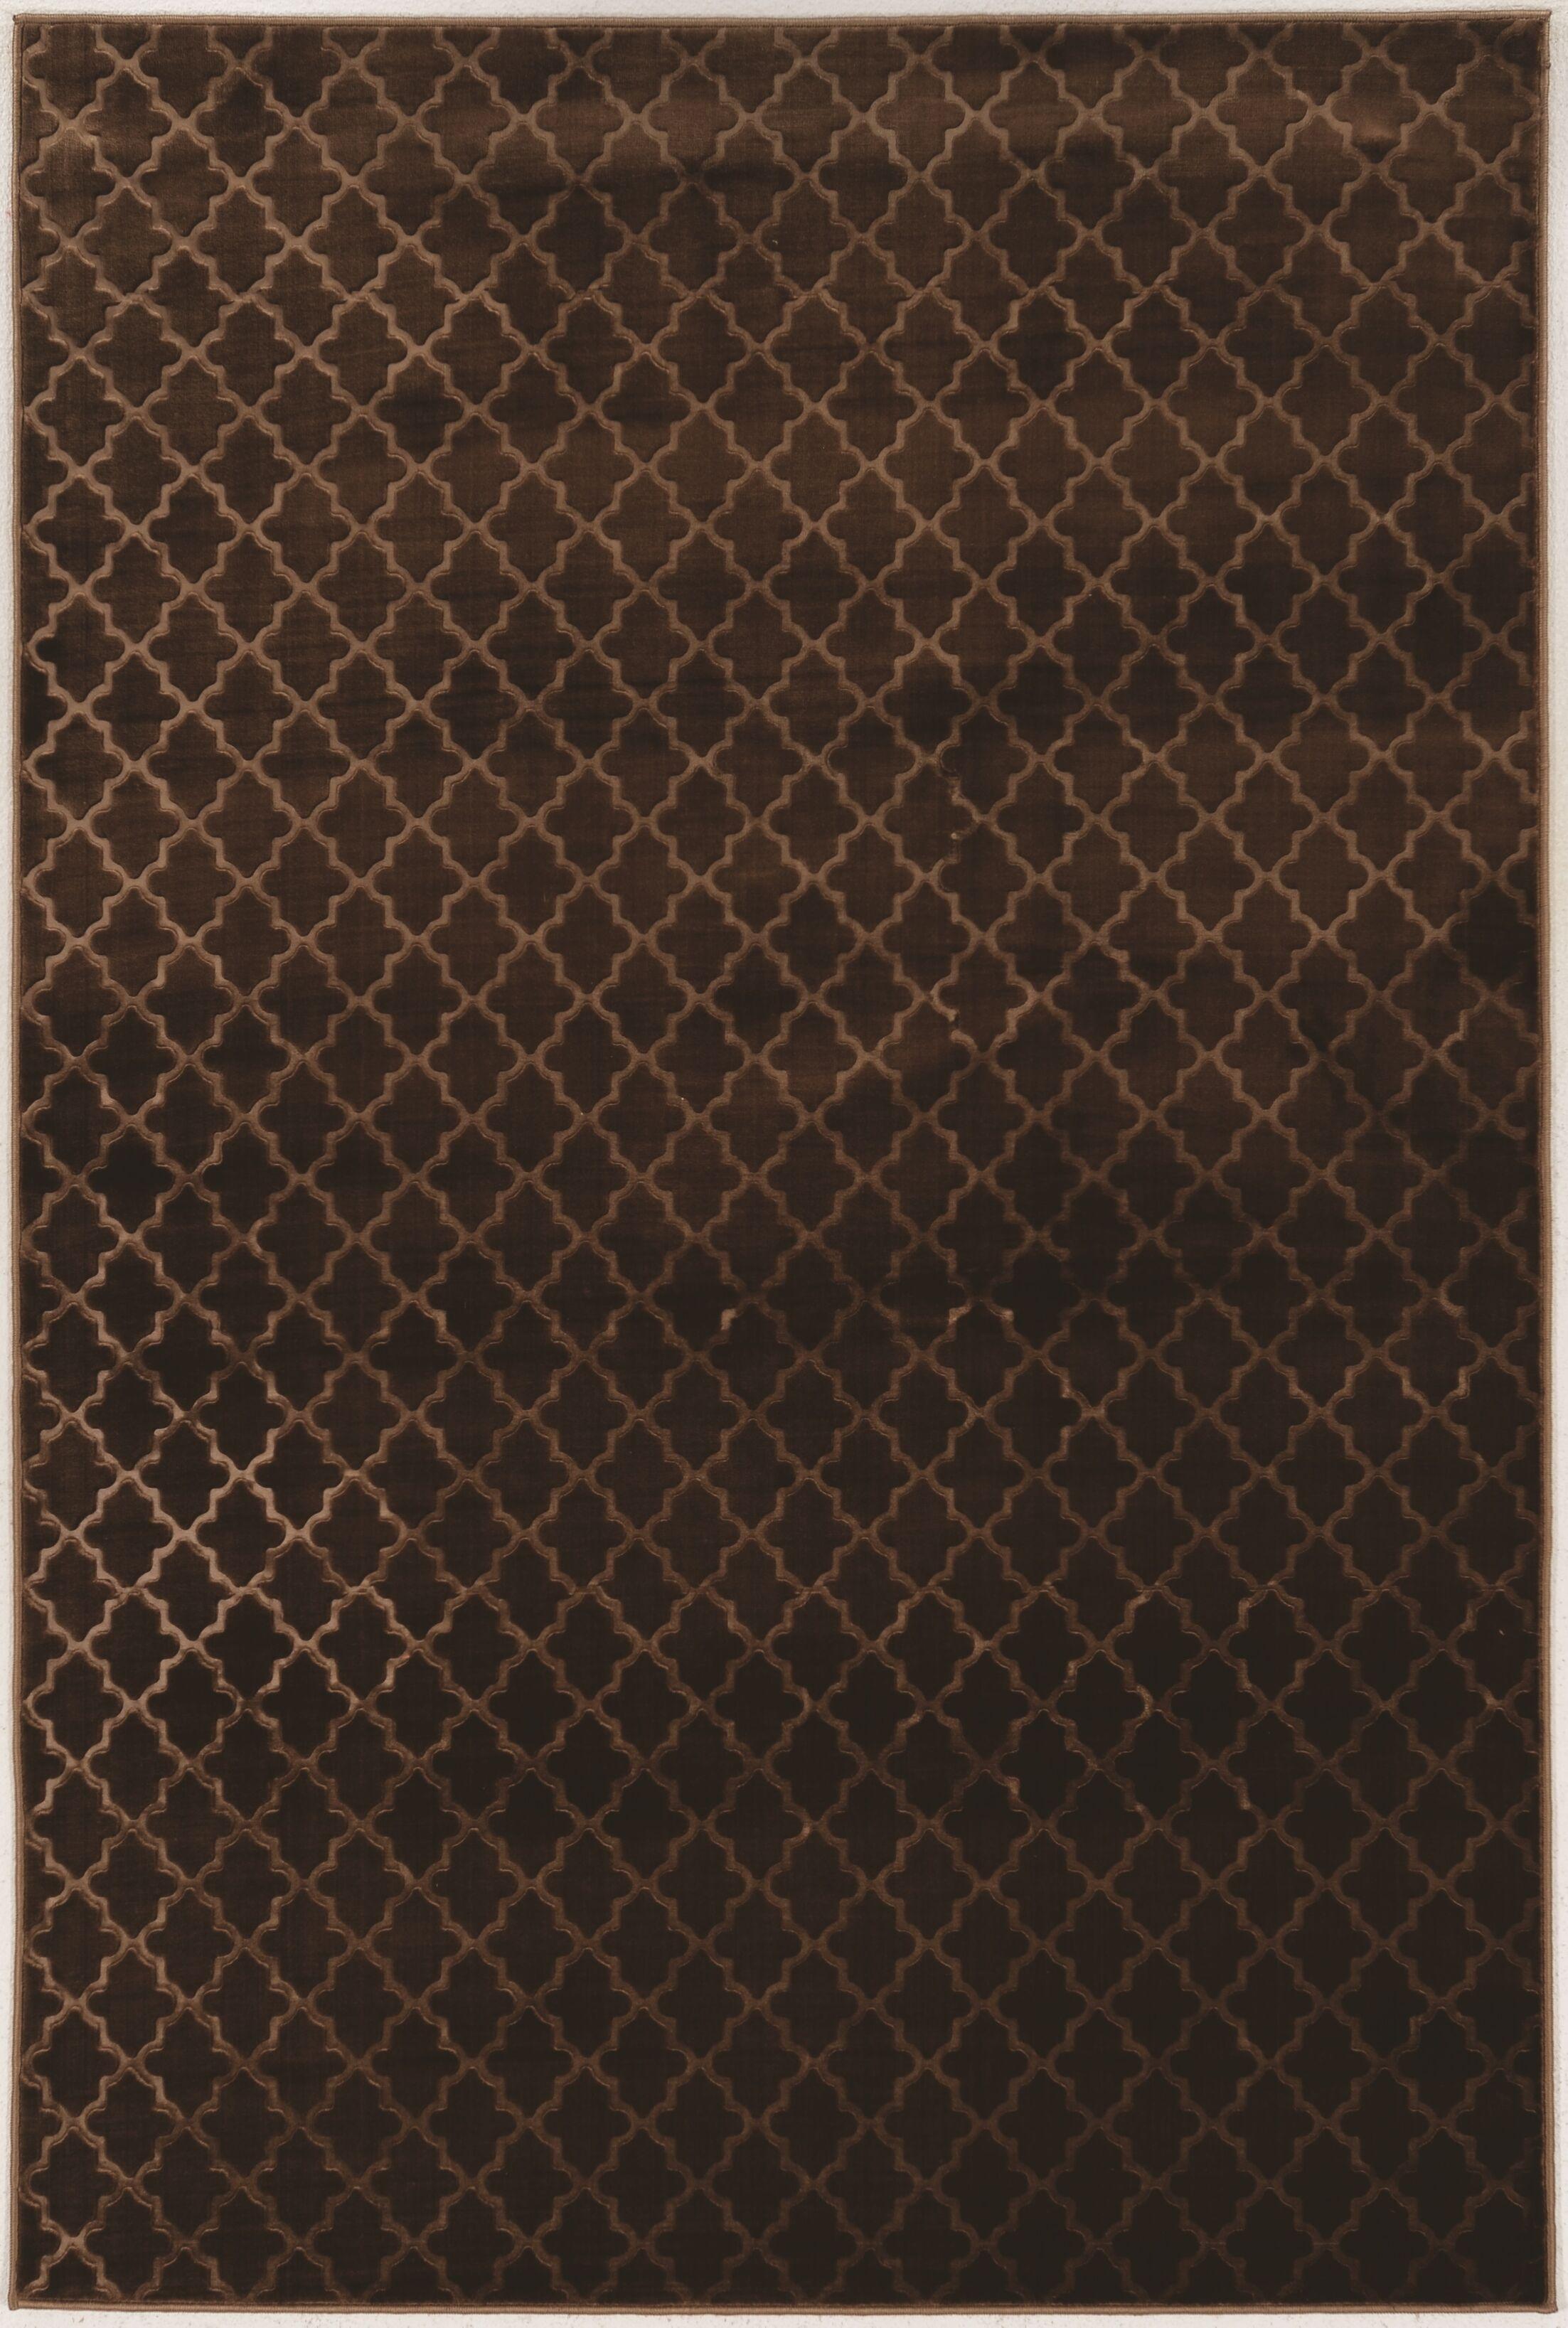 Boone Trellis Brown Area Rug Rug Size: Rectangle 8' x 10'3